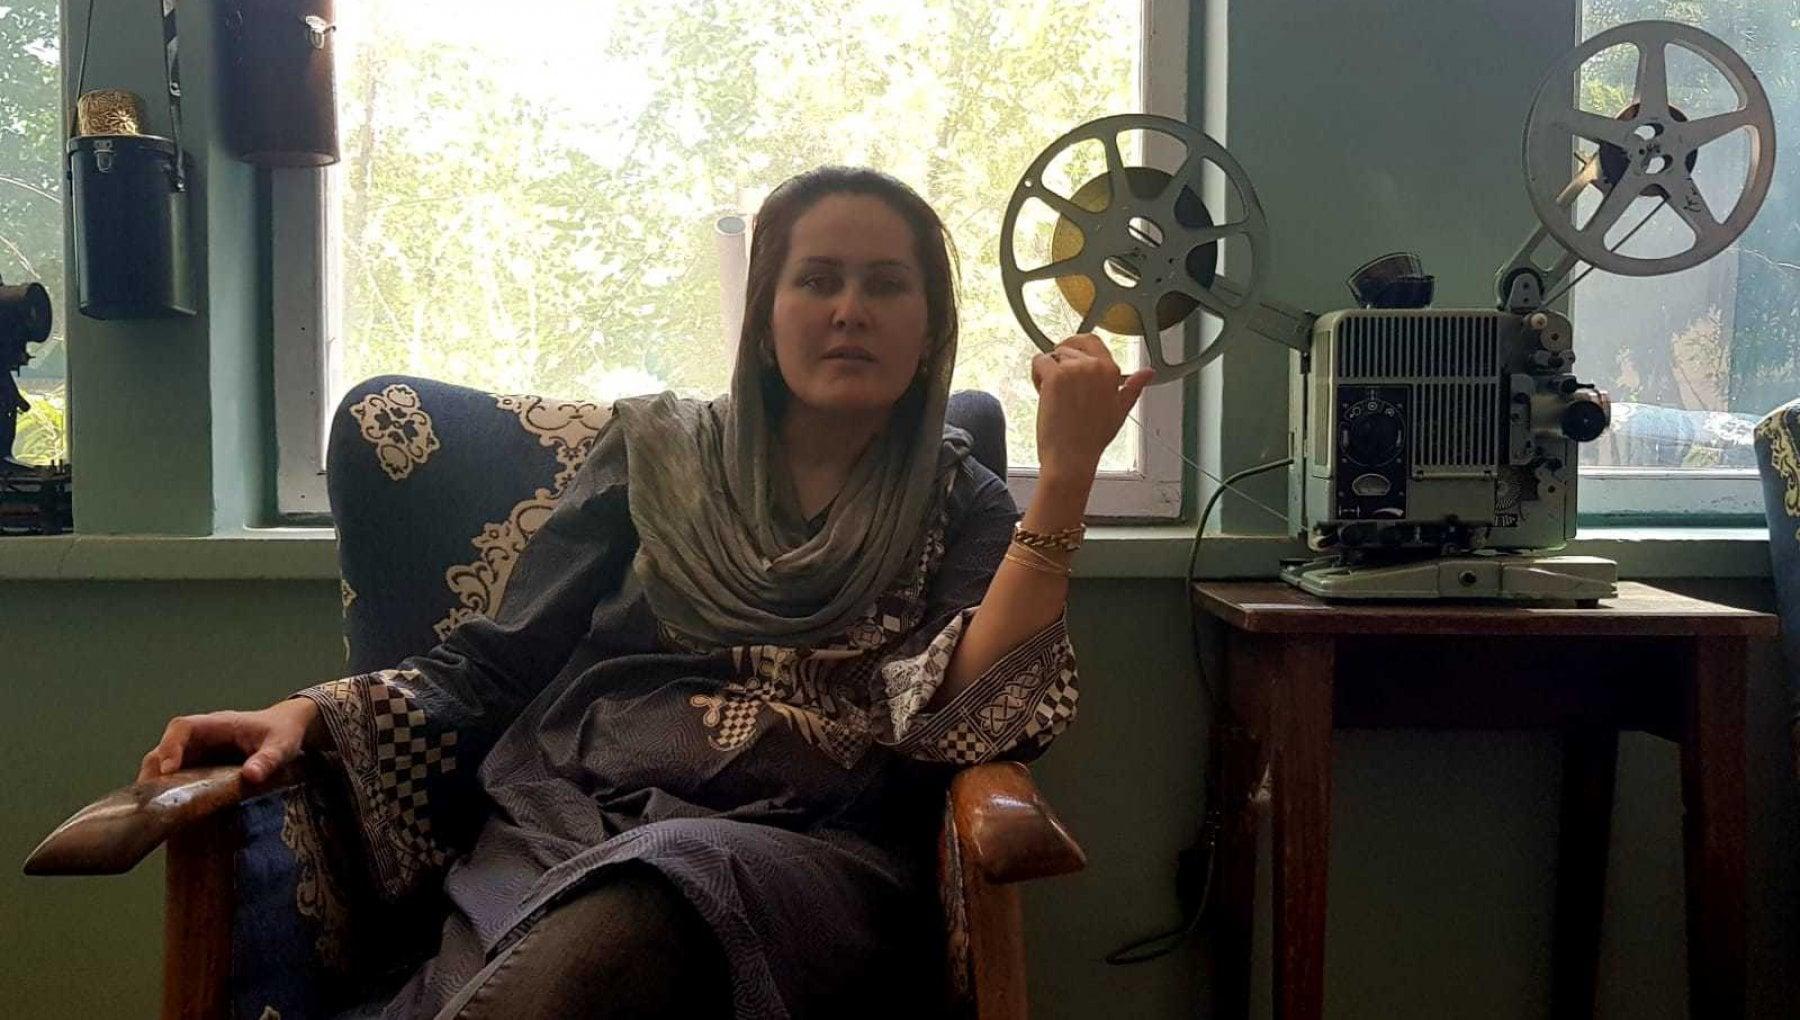 "224508996 6f941ec4 a8bc 40bf b268 82c0cfd8a54a - Fare cinema a Kabul, il coraggio di Saharaa: ""Se tornano i talebani, mi uccidono"""